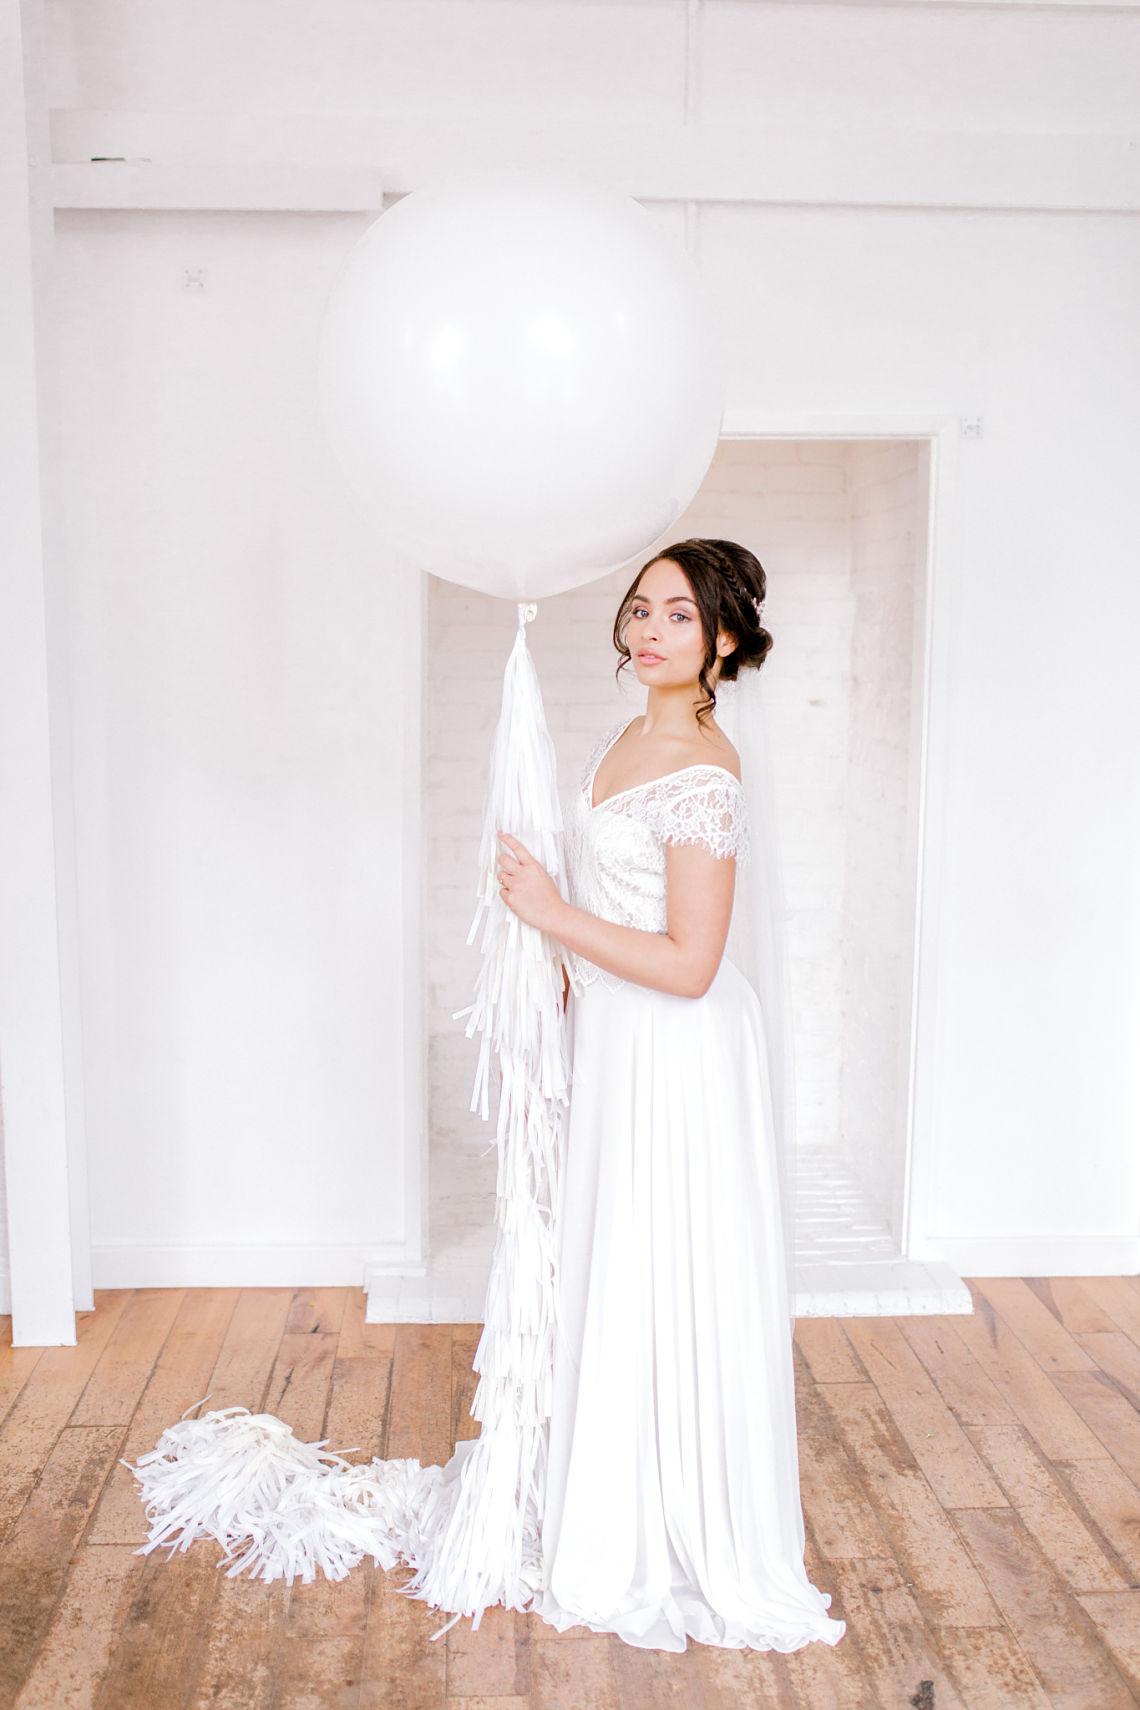 bridal shots - giant balloon - wedding day photography - essex wedding planner